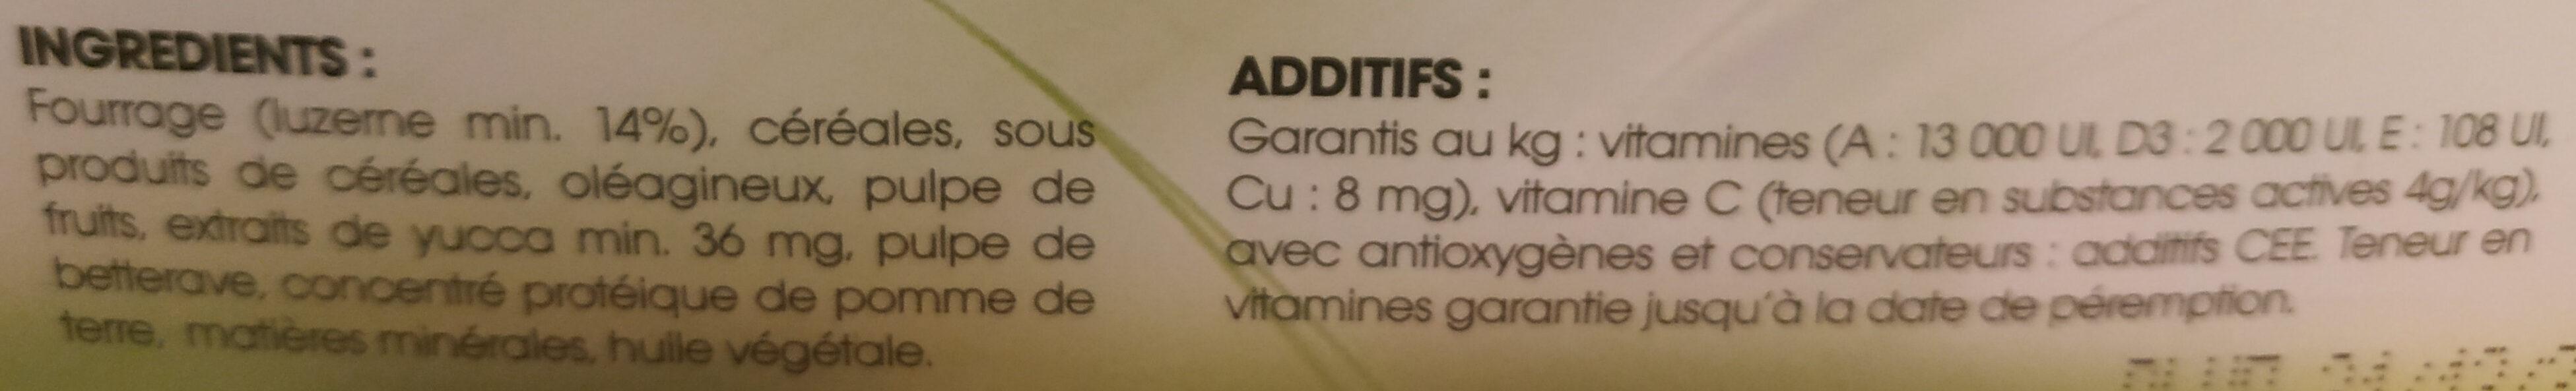 Repas complet - Ingrédients - fr